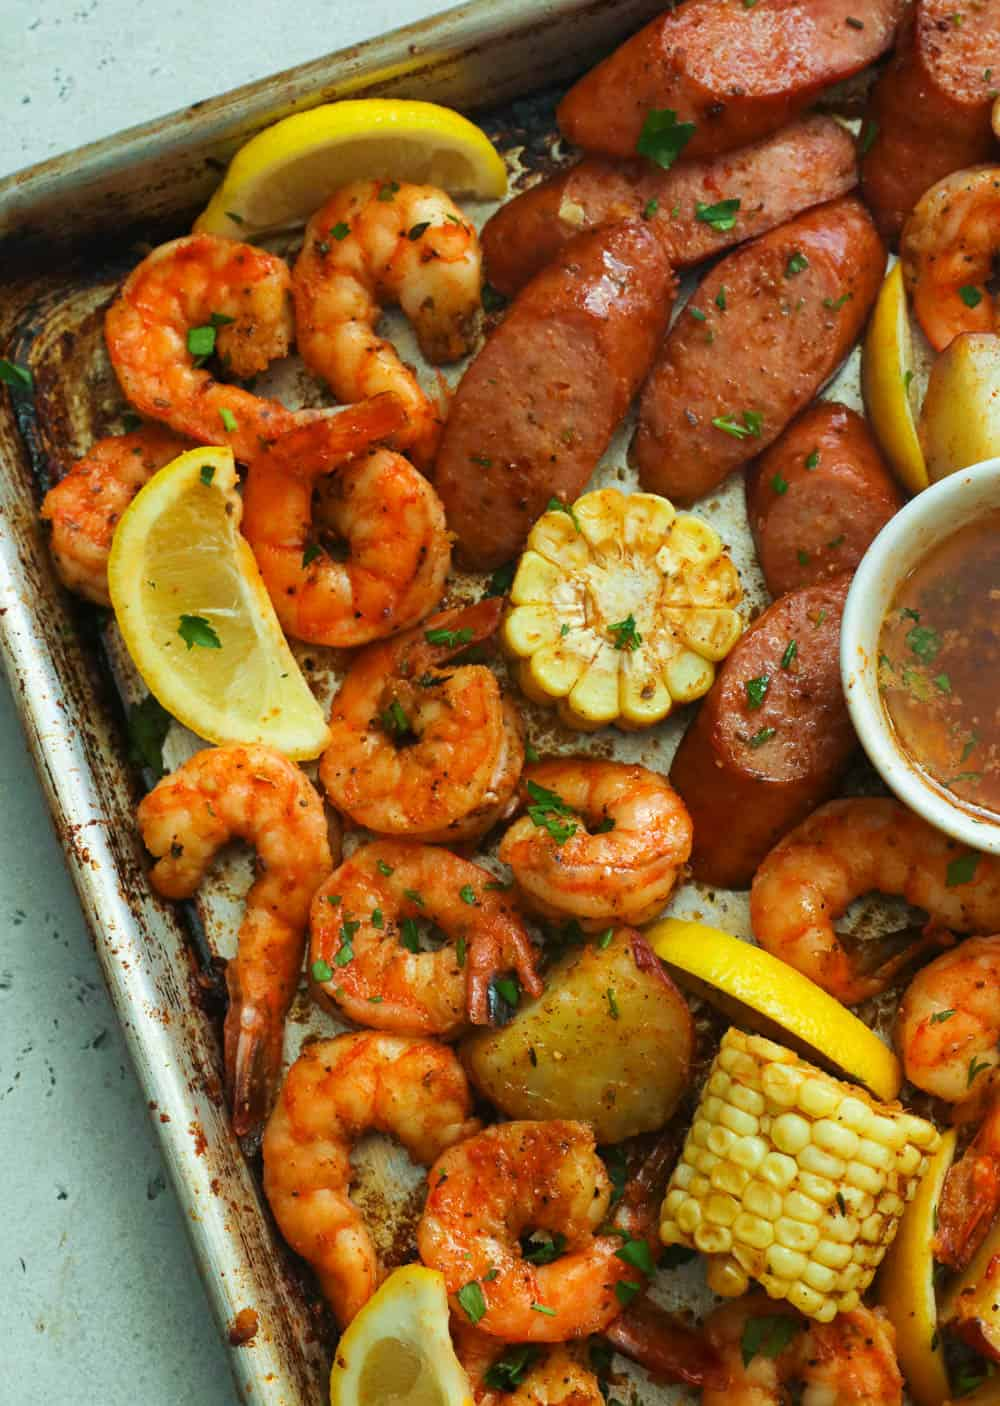 Cajun shrimp and sausage boil garnished with cilantro and lemon slices